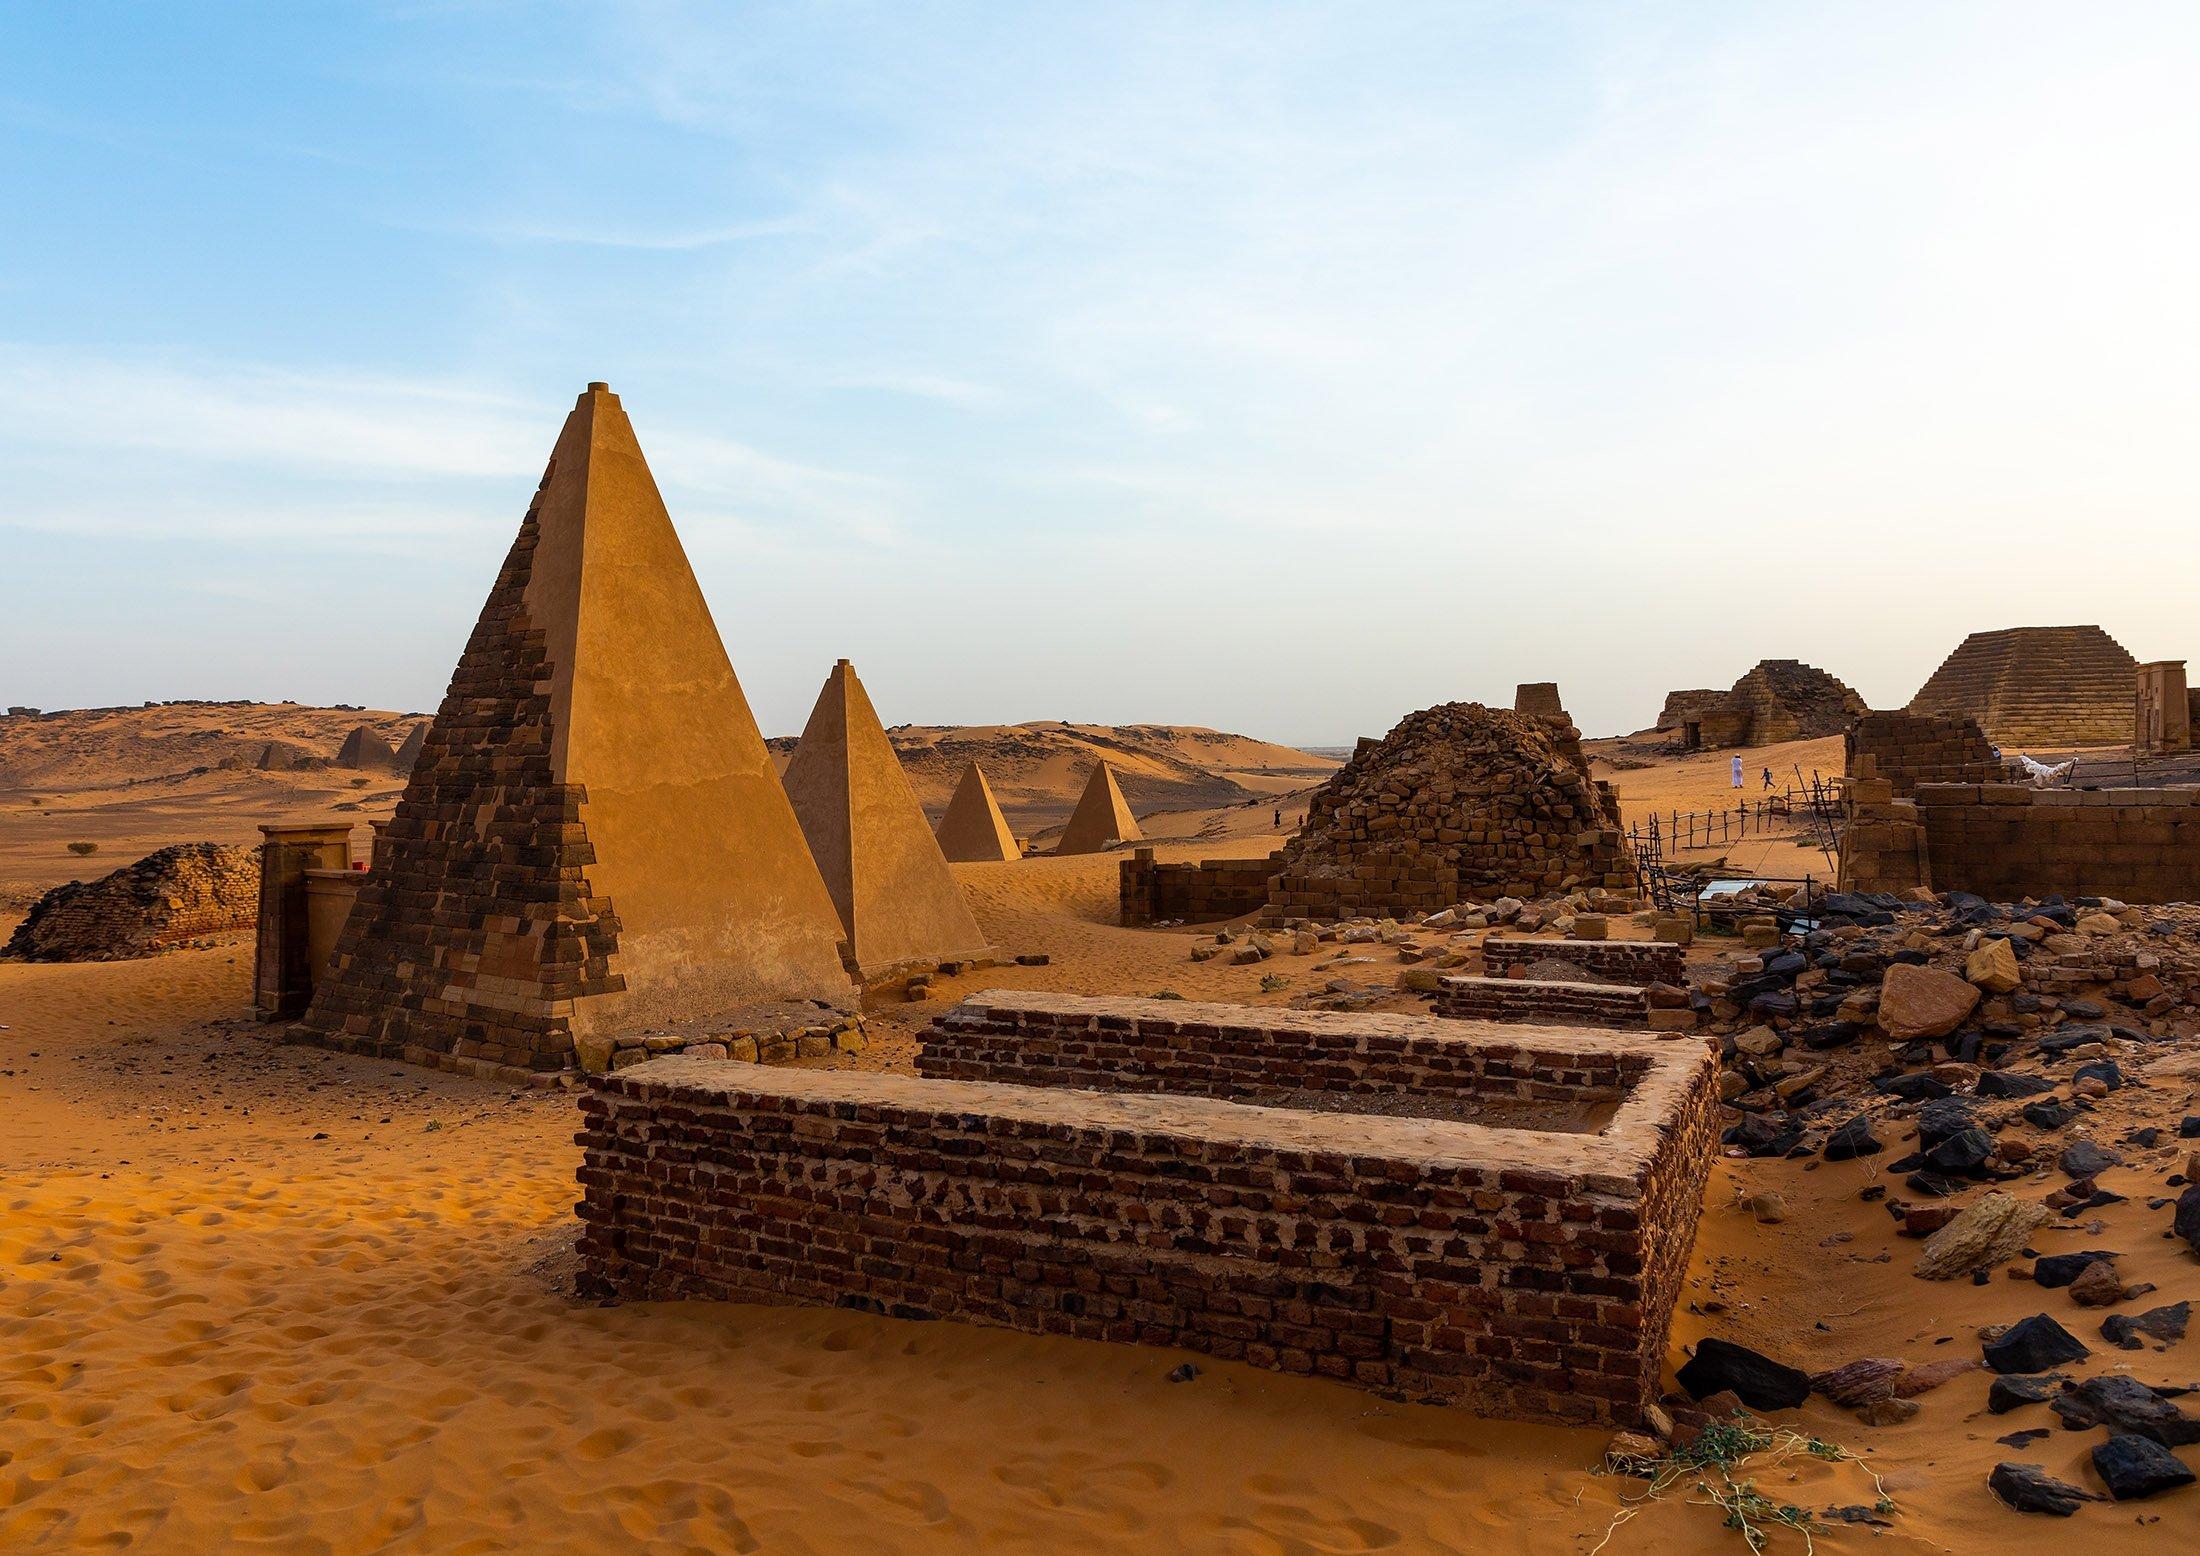 Pyramids of Sudan – The Forgotten Nubian Pyramids